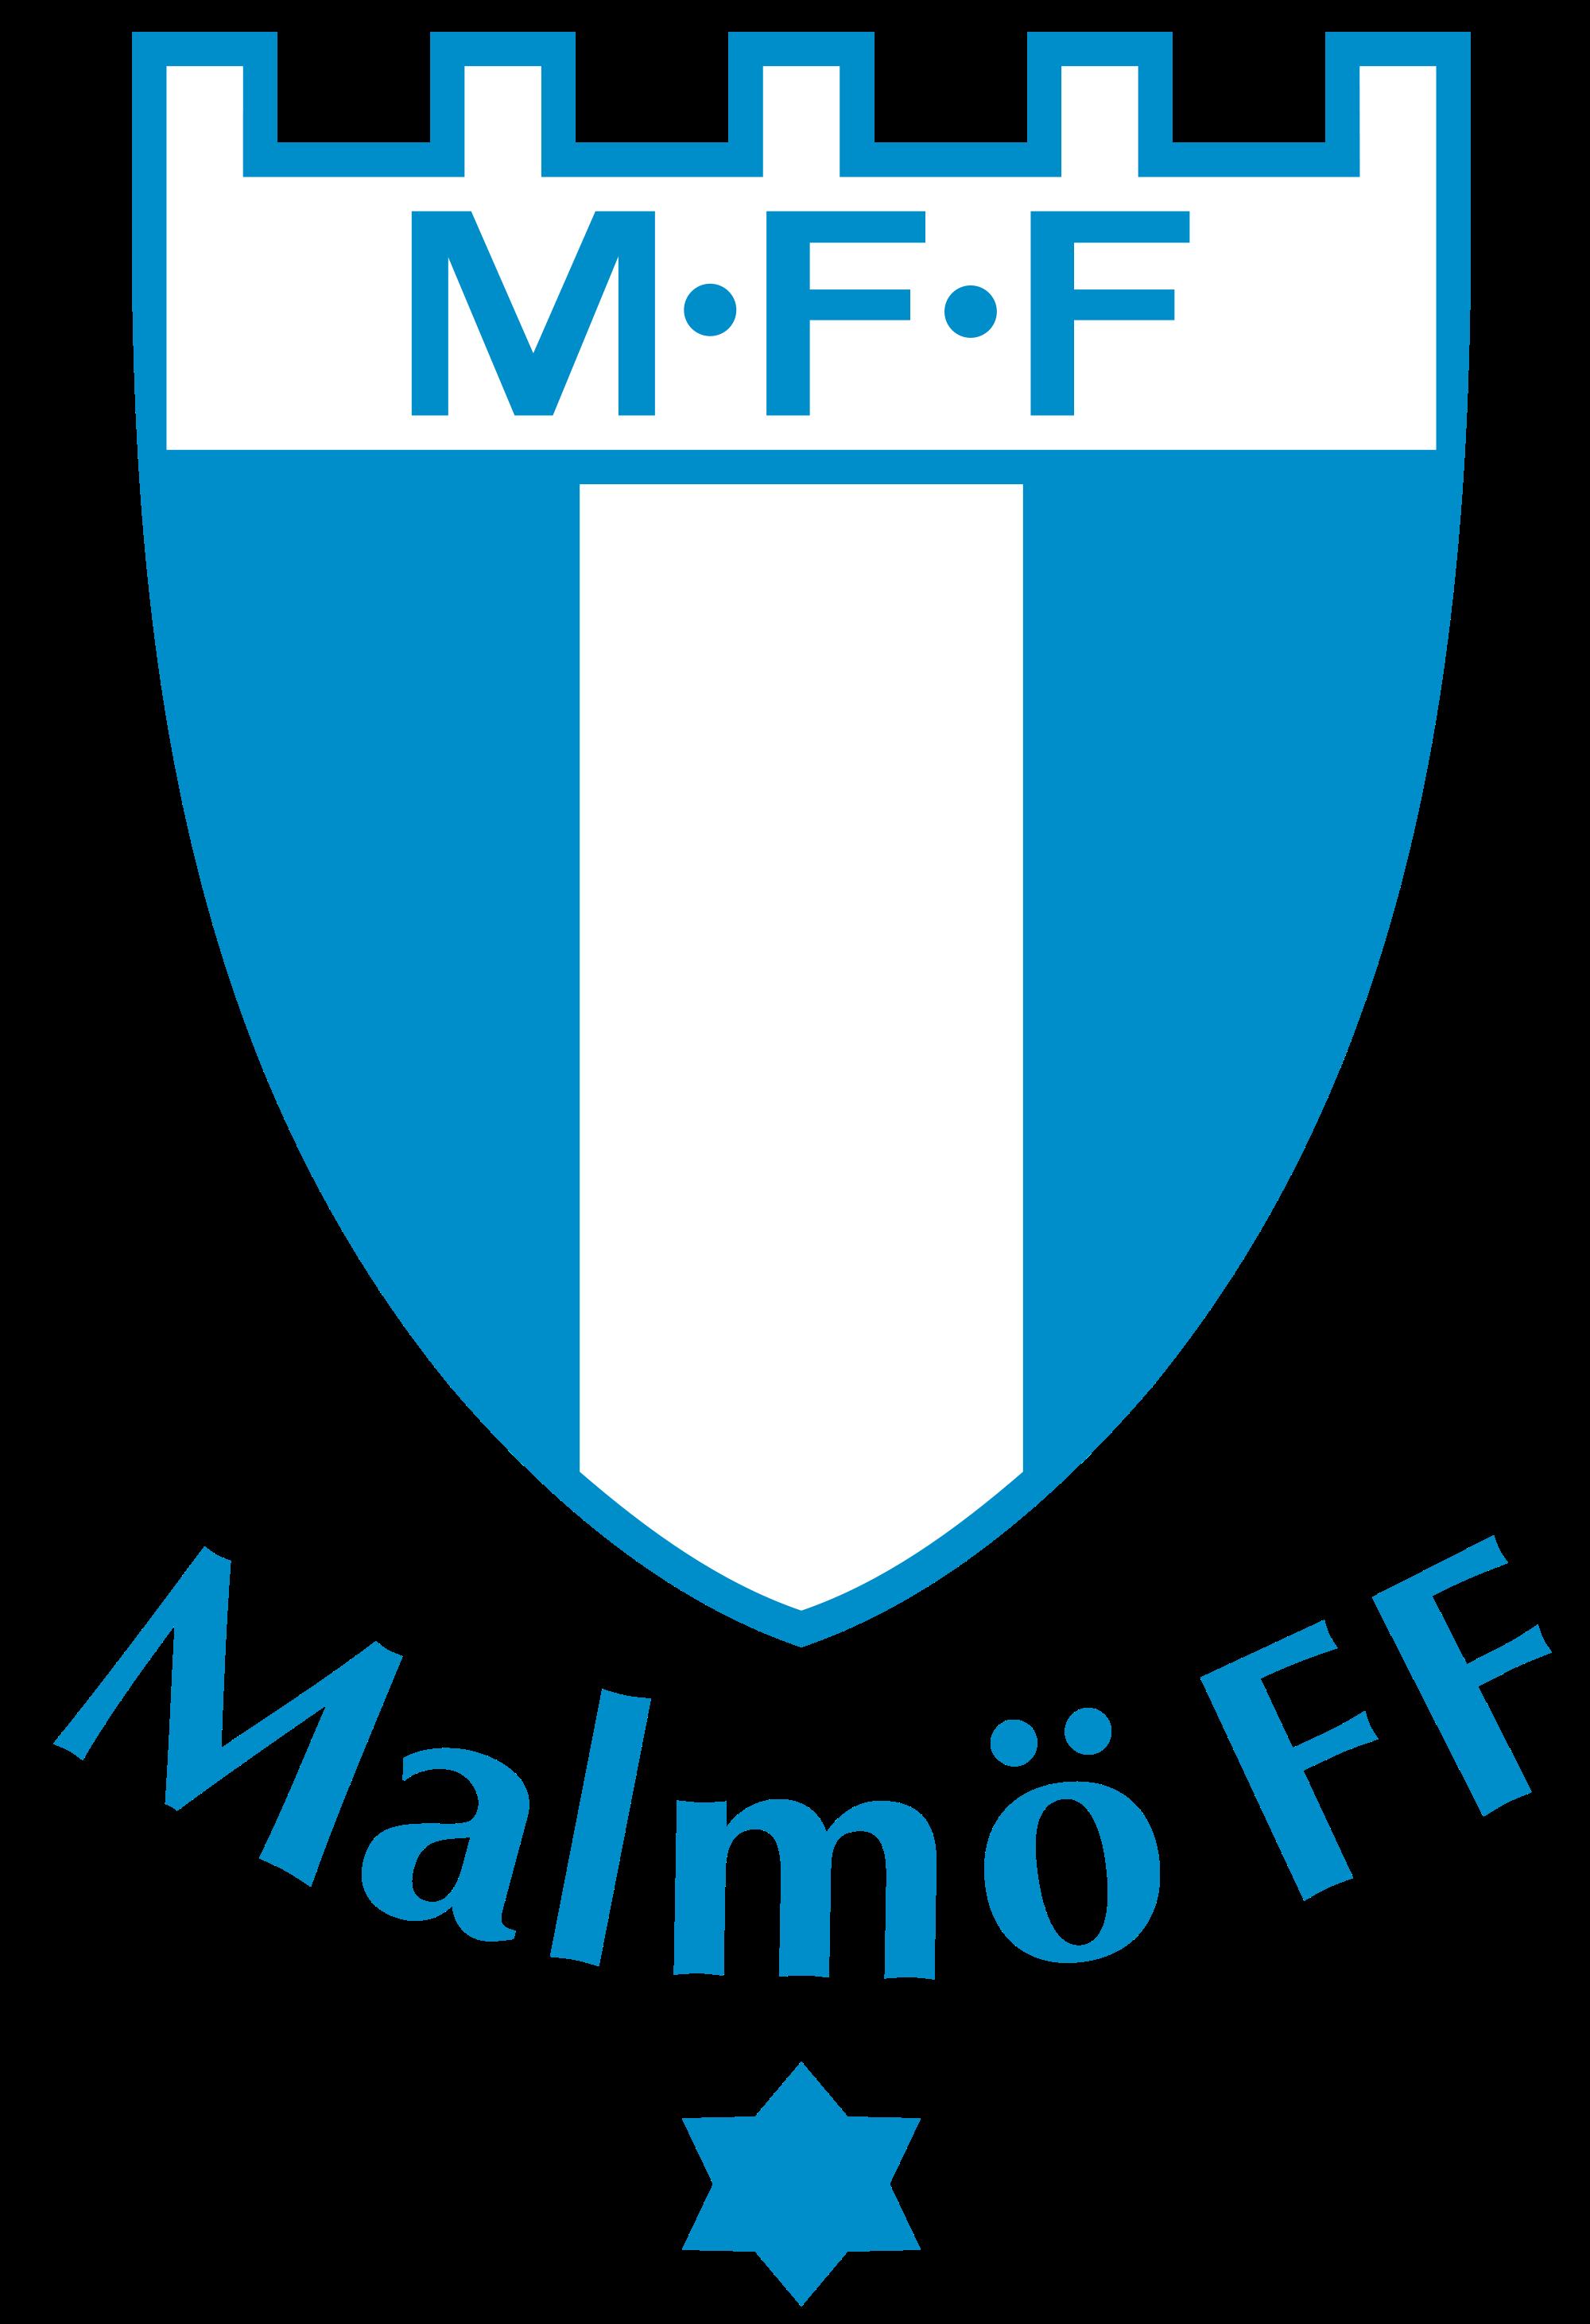 https://upload.wikimedia.org/wikipedia/it/3/33/Malm%C3%B6_FF_Logo.png